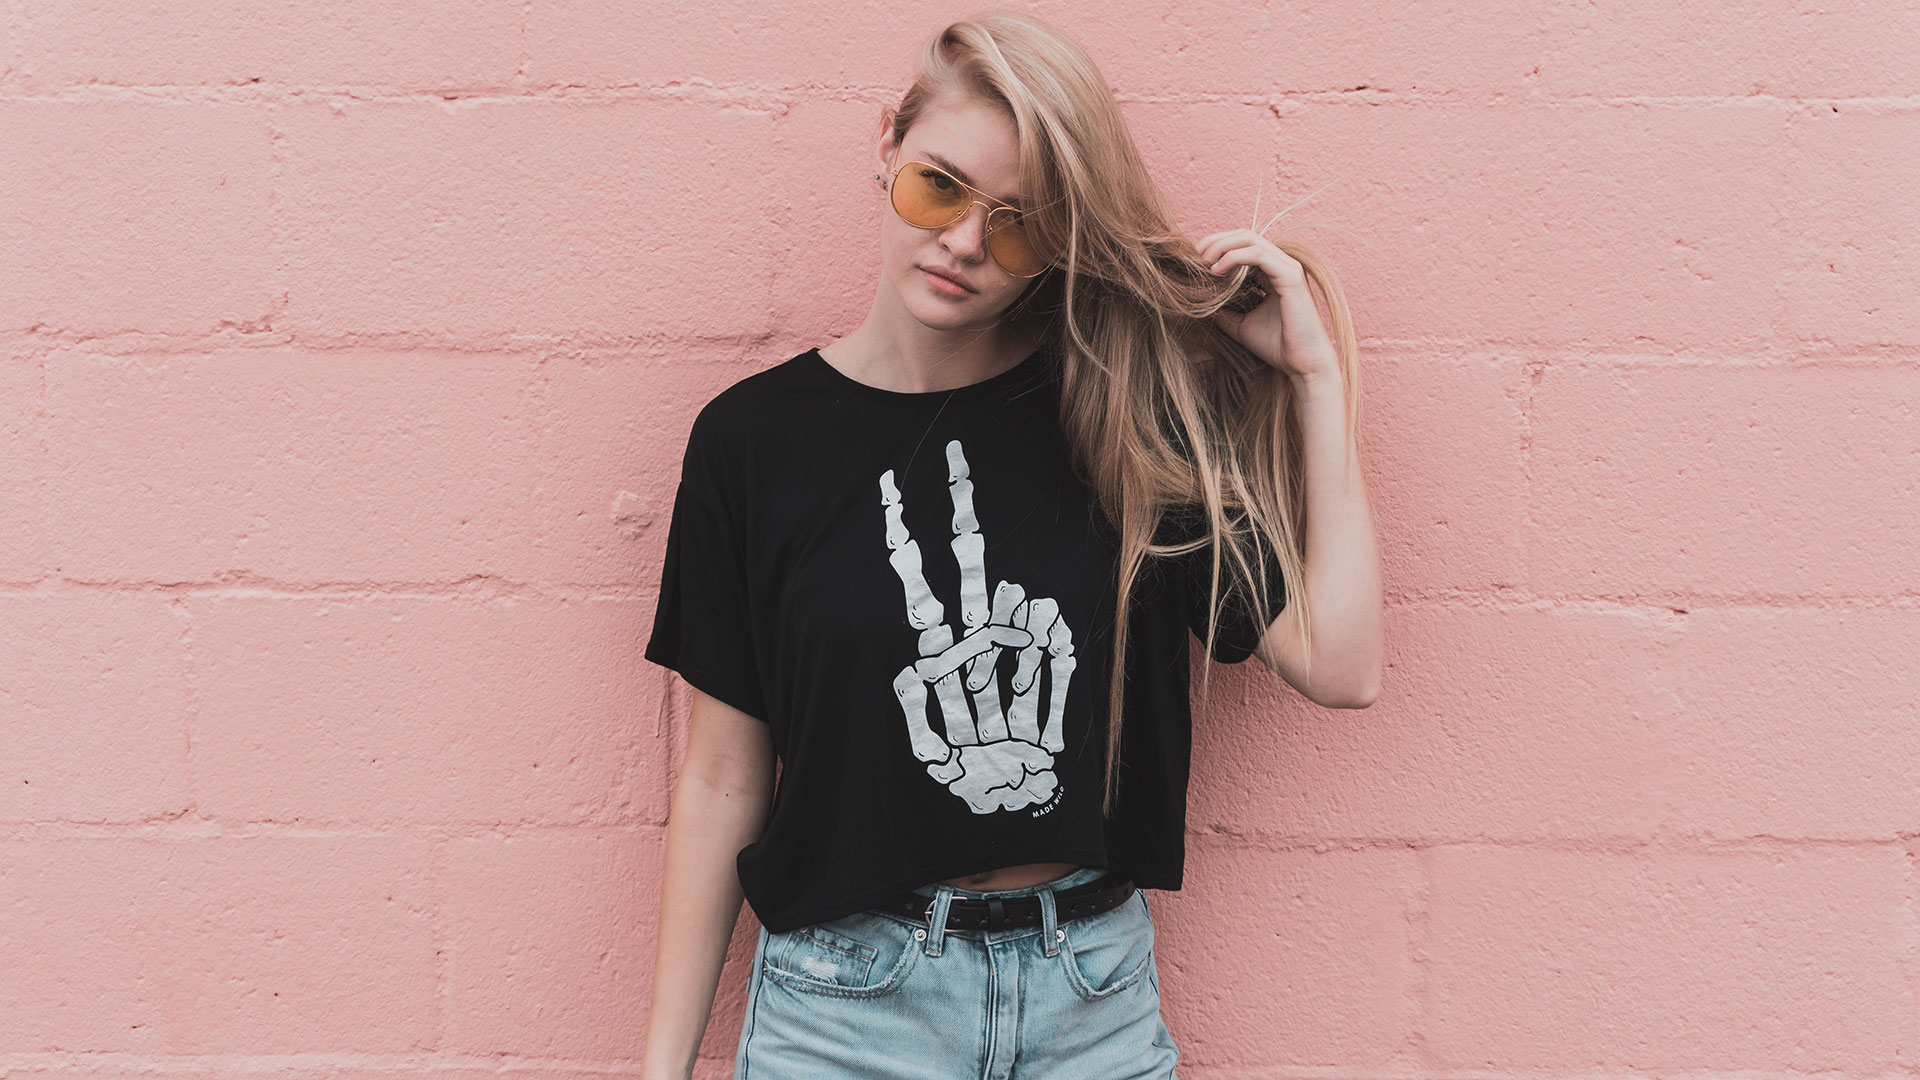 T-shirt originali online: scopri tantissime idee regalo per lei